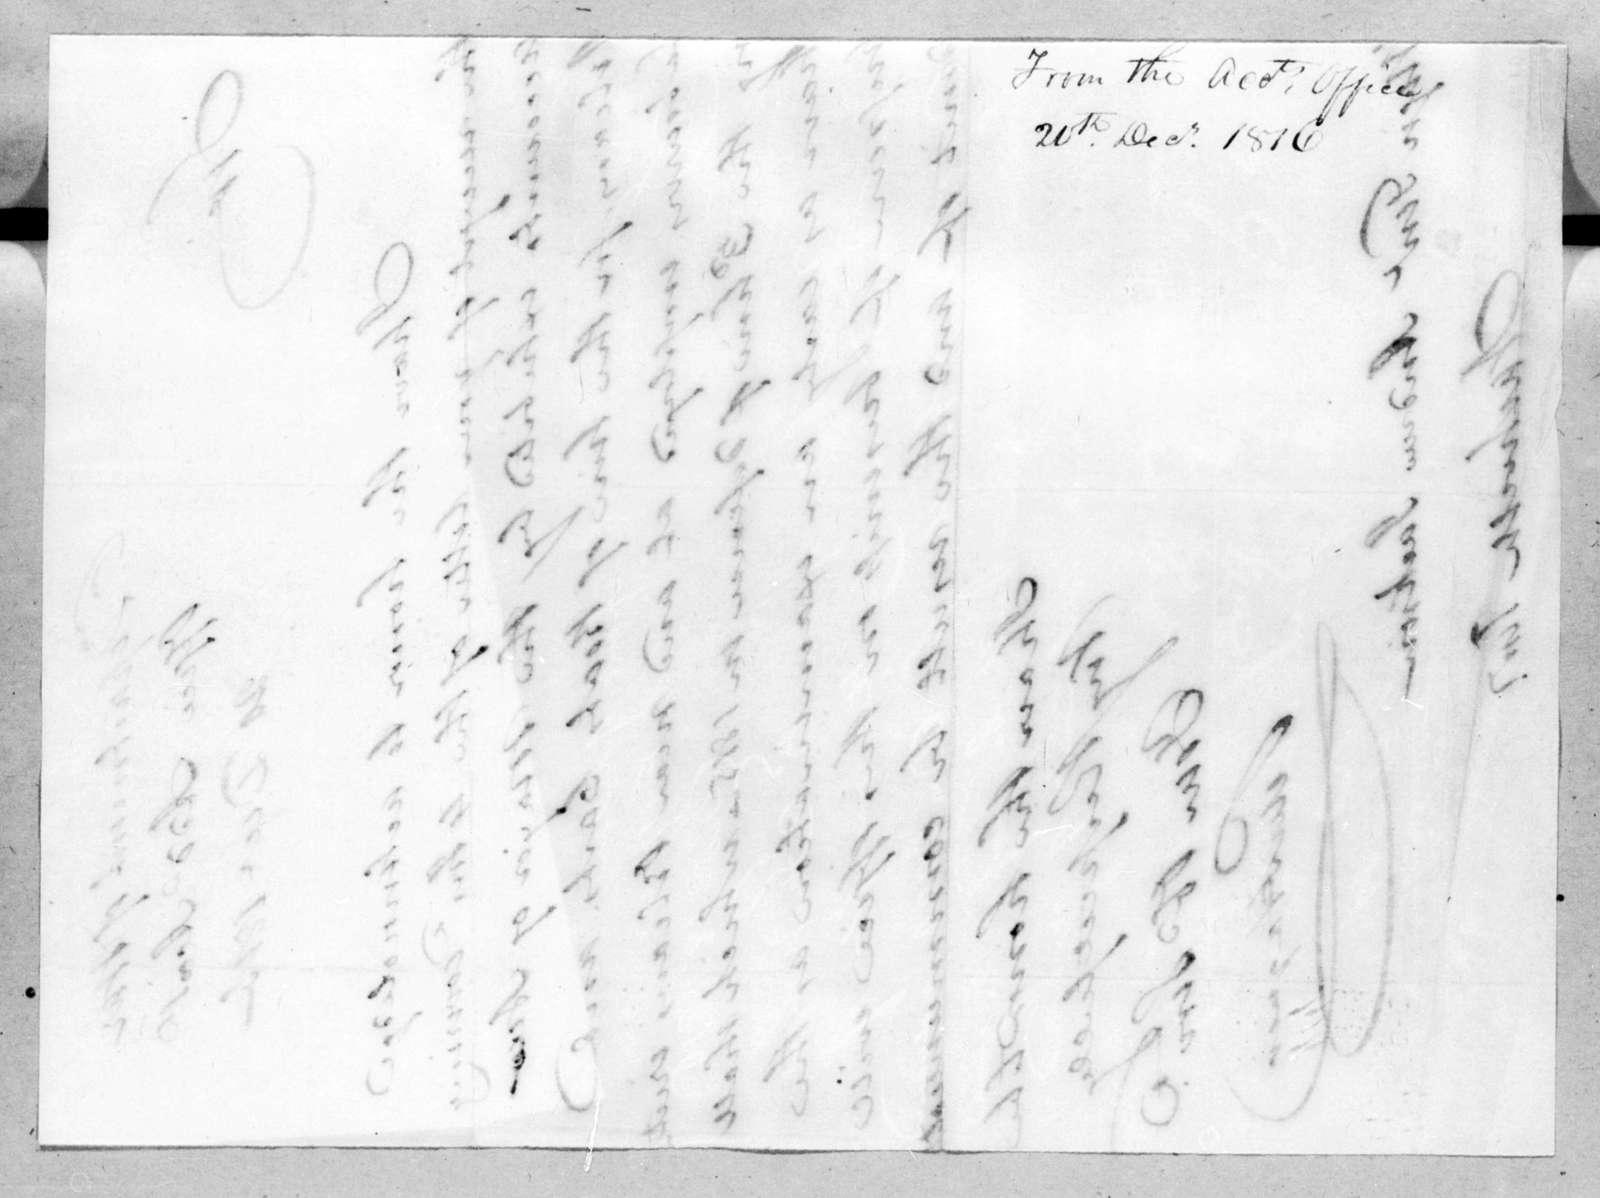 Peter Hagner to Andrew Jackson, December 20, 1816